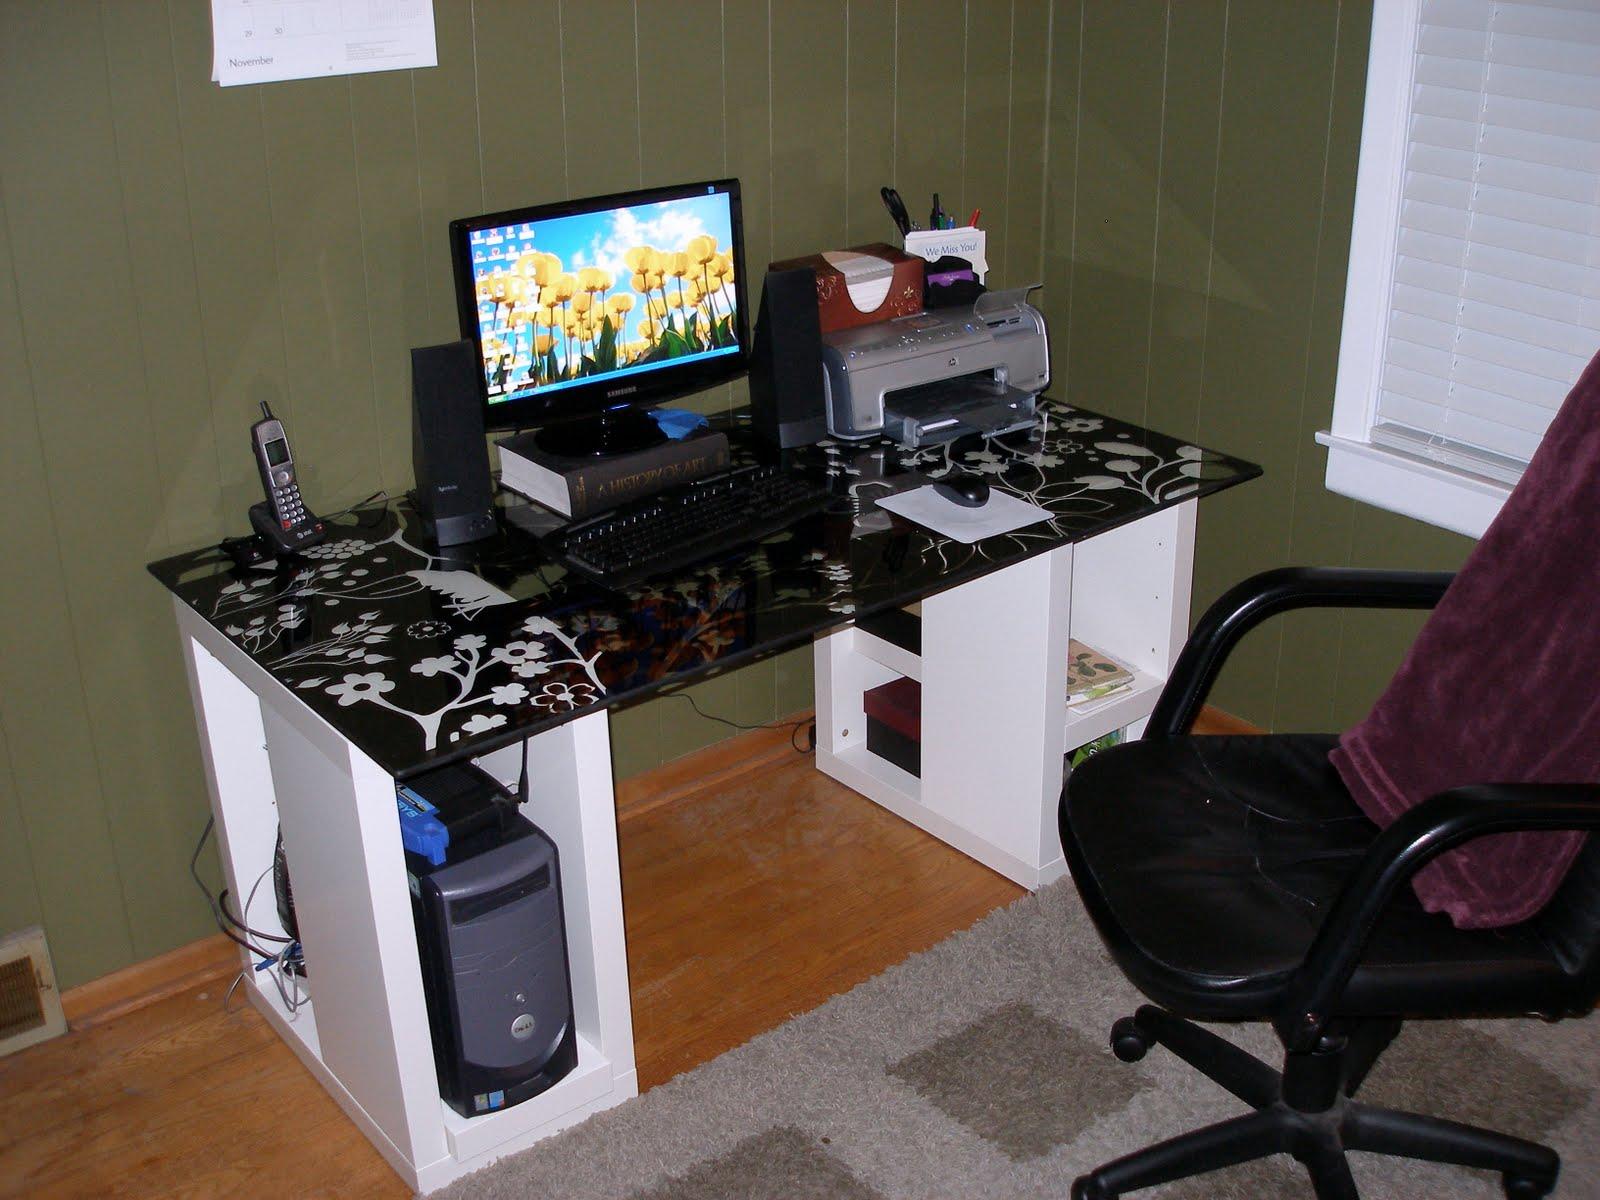 Best Home Computer Desk: Homemade Computer Desk Plans PDF Woodworking